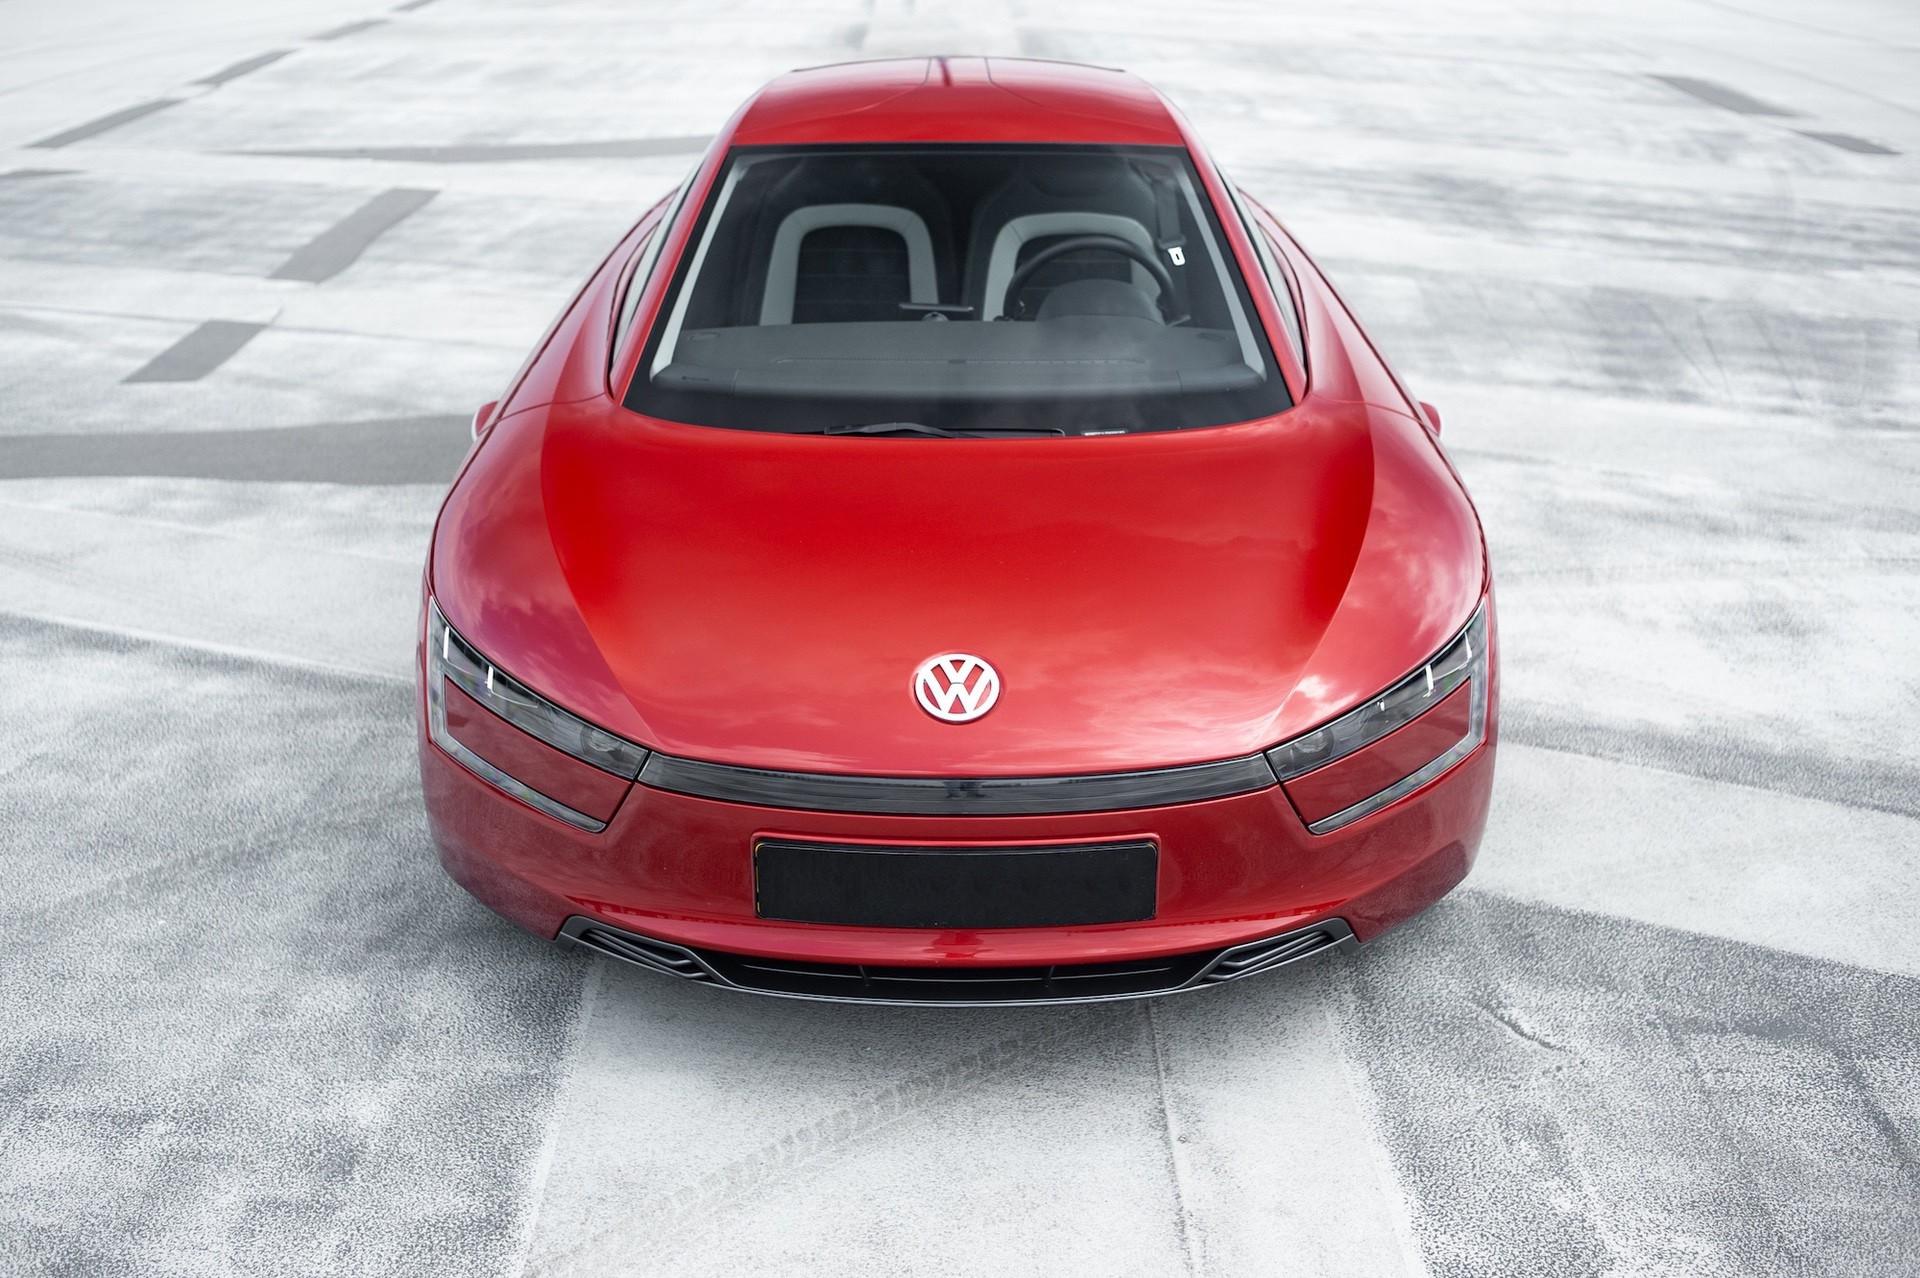 Volkswagen_XL1_sale-0039